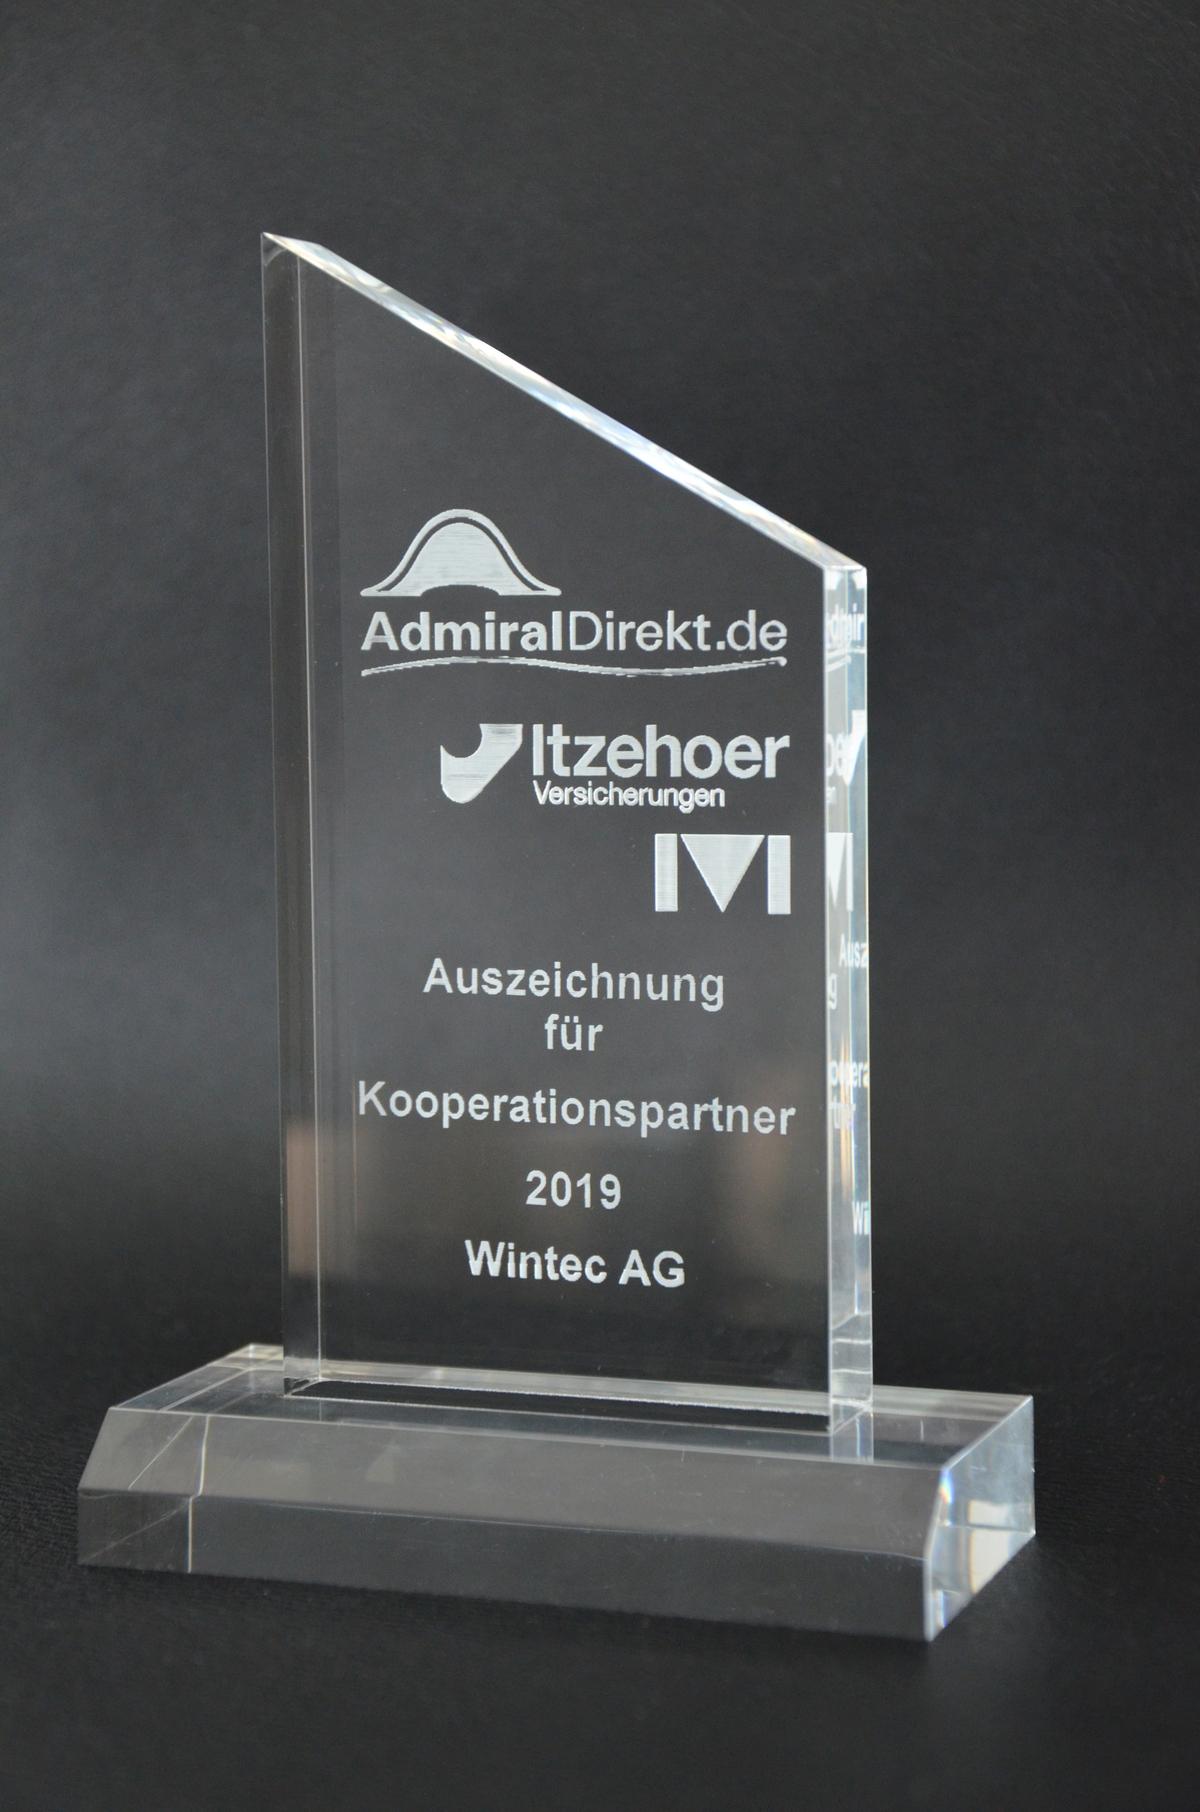 Kooperationspartner Des Jahres 2019 Wintec Autoglas Erhalt